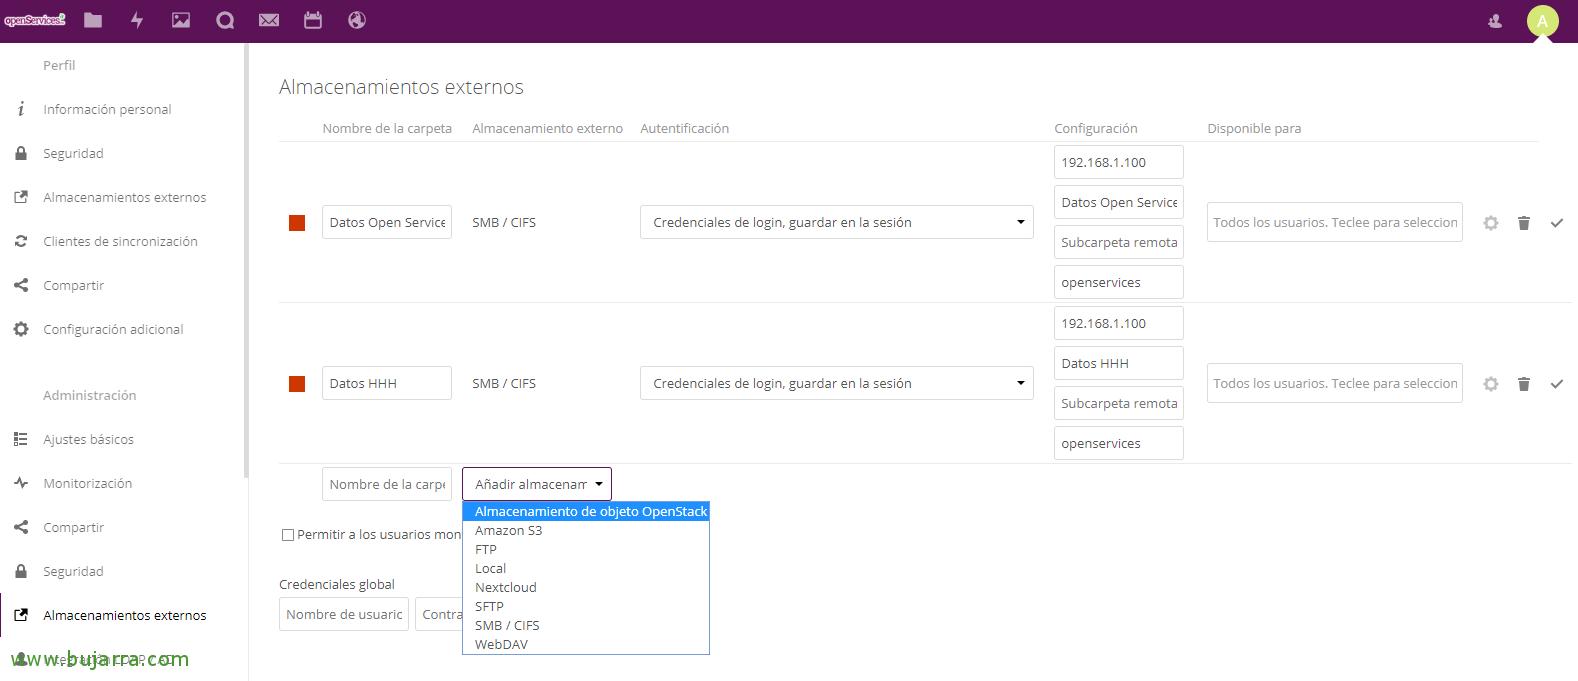 Enabling access to external data Nextcloud | Blog Bujarra com